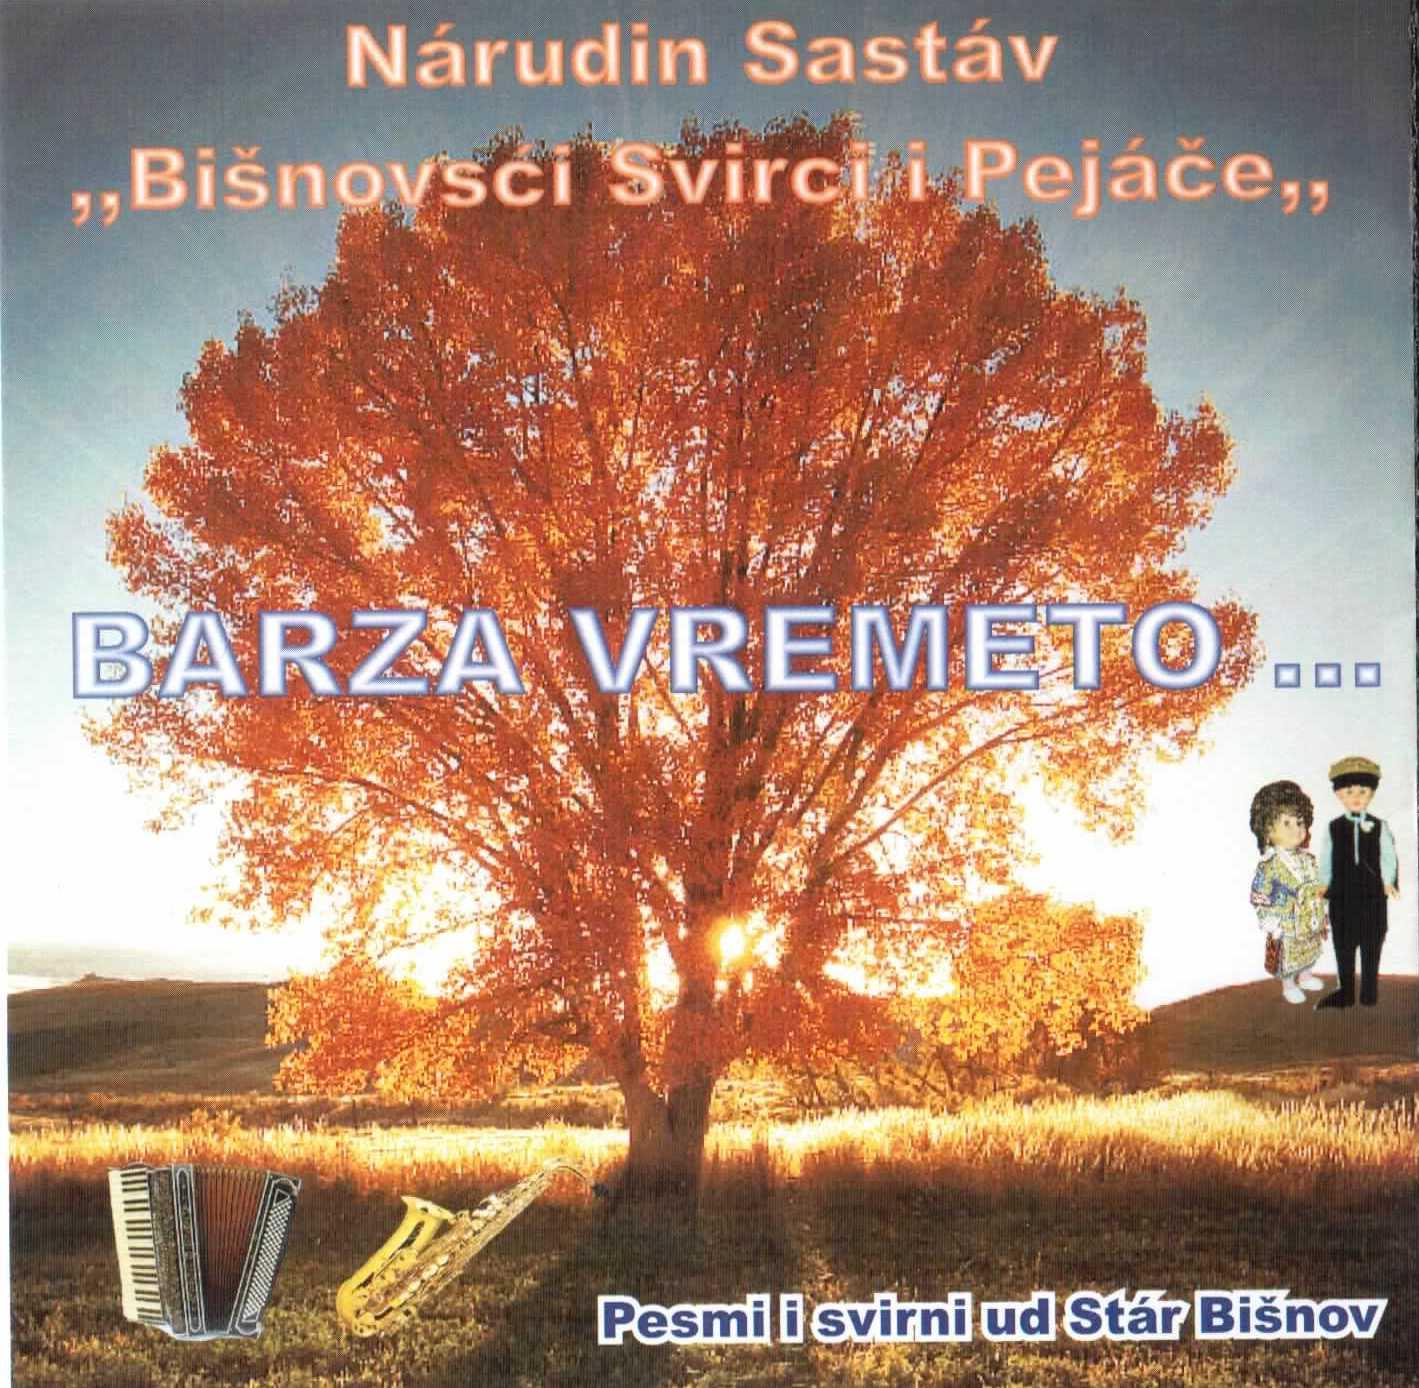 Asociatia culturala bulgara Dudestii Vechi